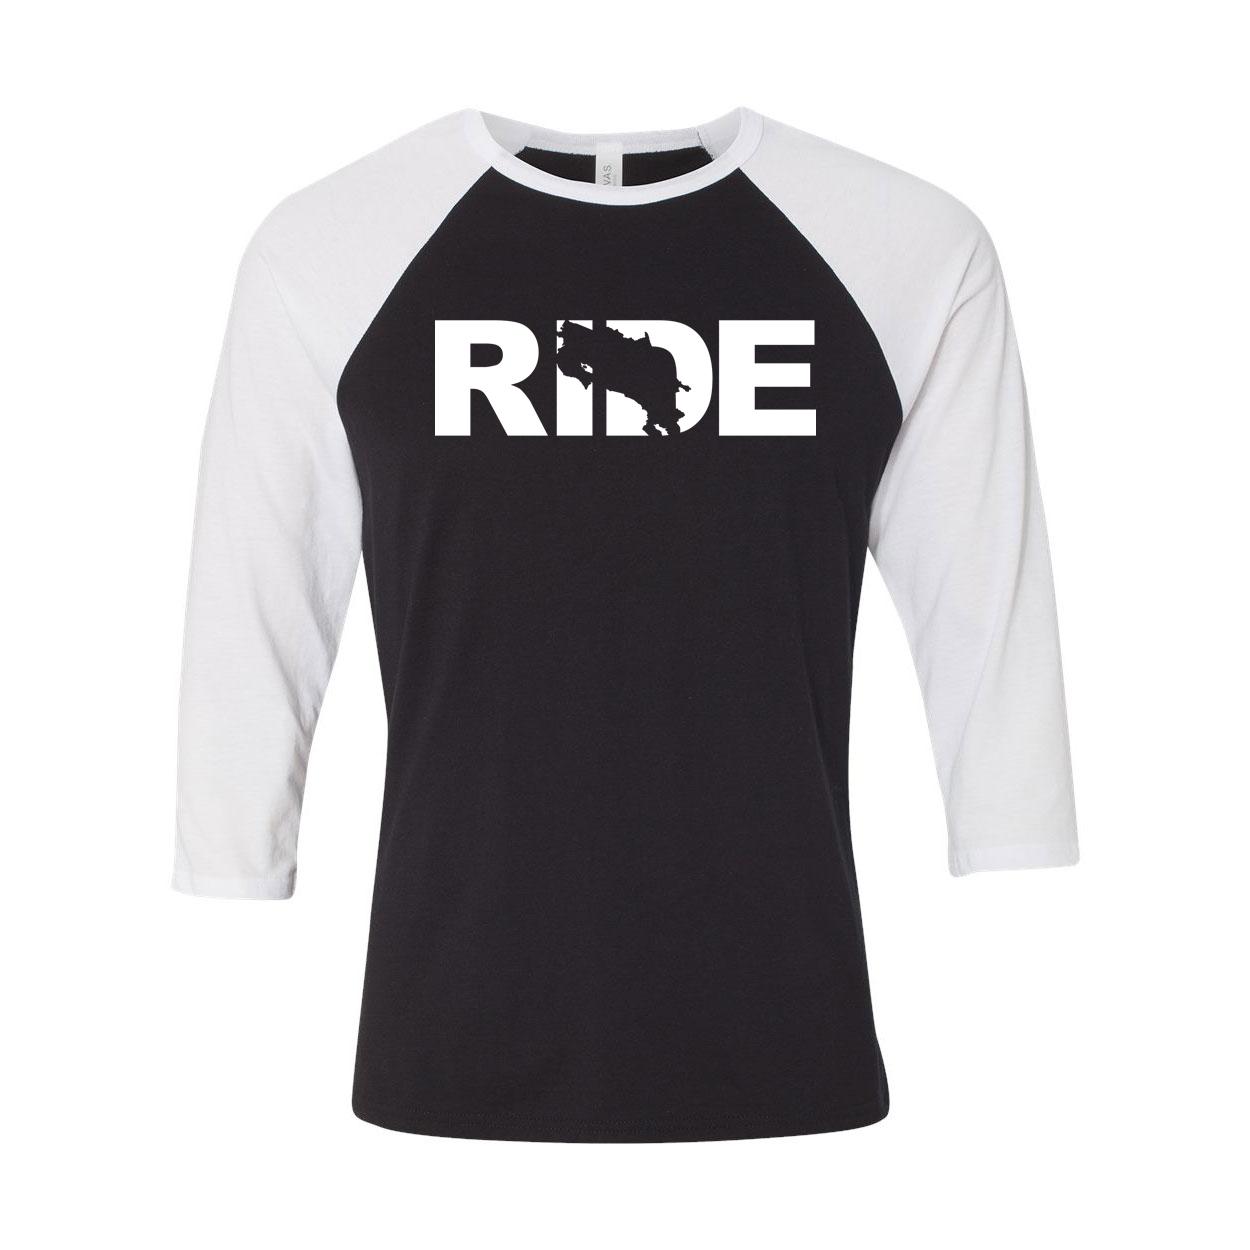 Ride Costa Rica Classic Raglan Shirt Black/White (White Logo)